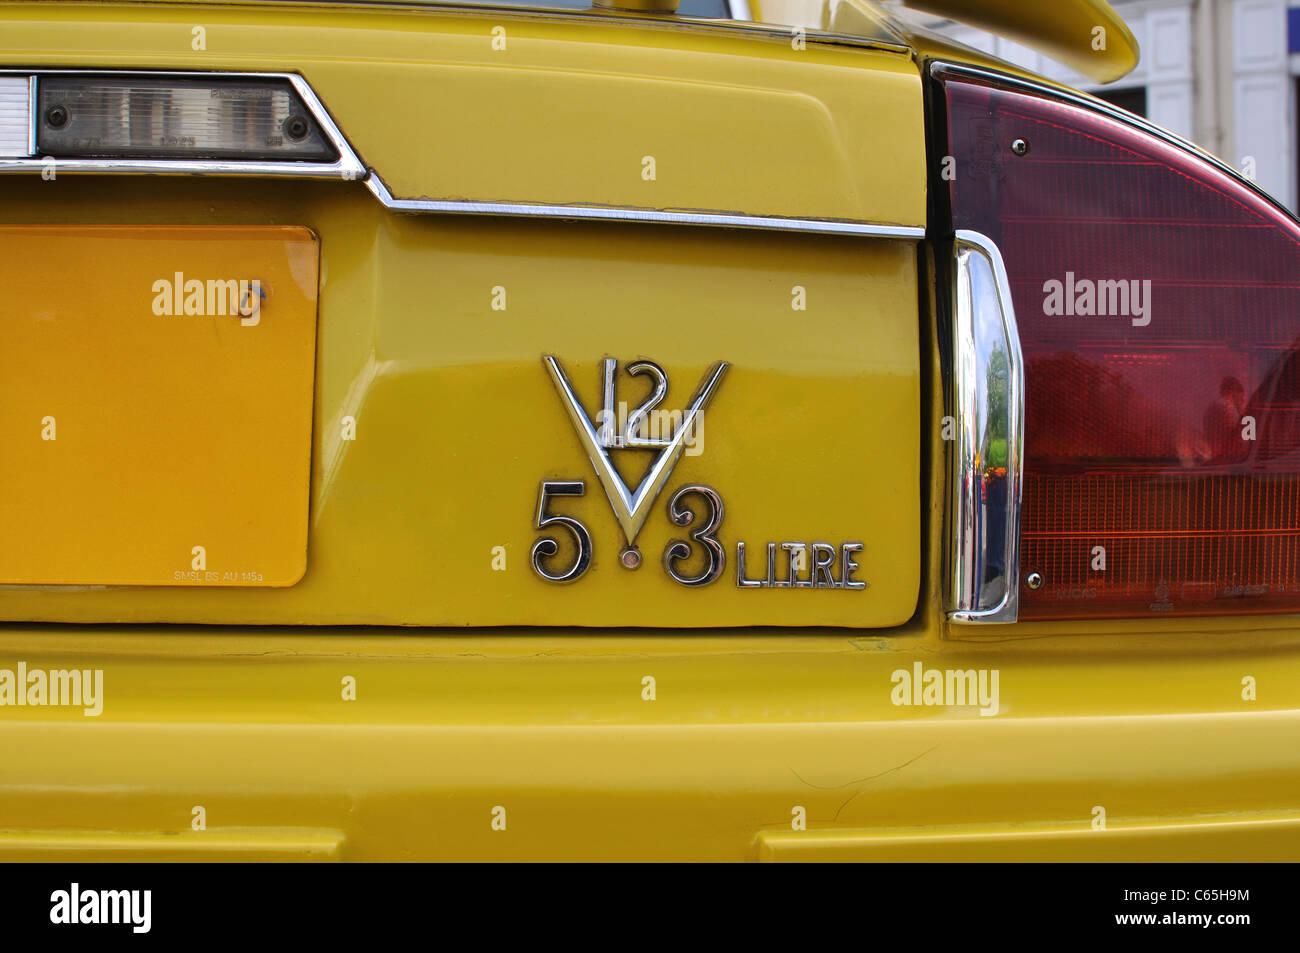 Jaguar XJS V12 5.3 litre - Stock Image